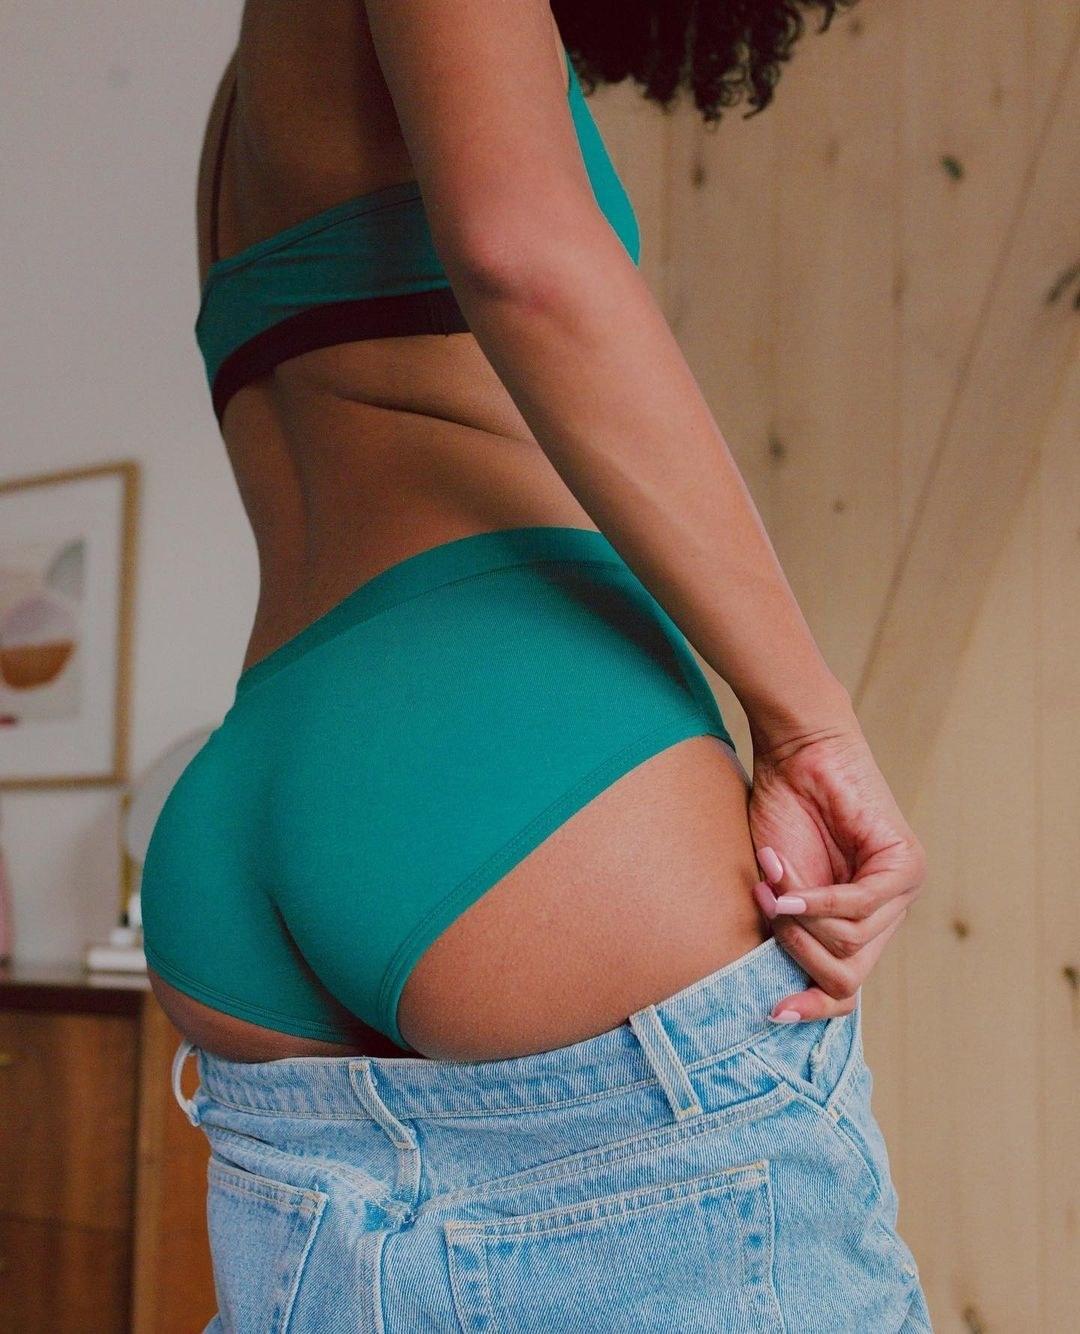 model wearing cheeky brief underwear in green